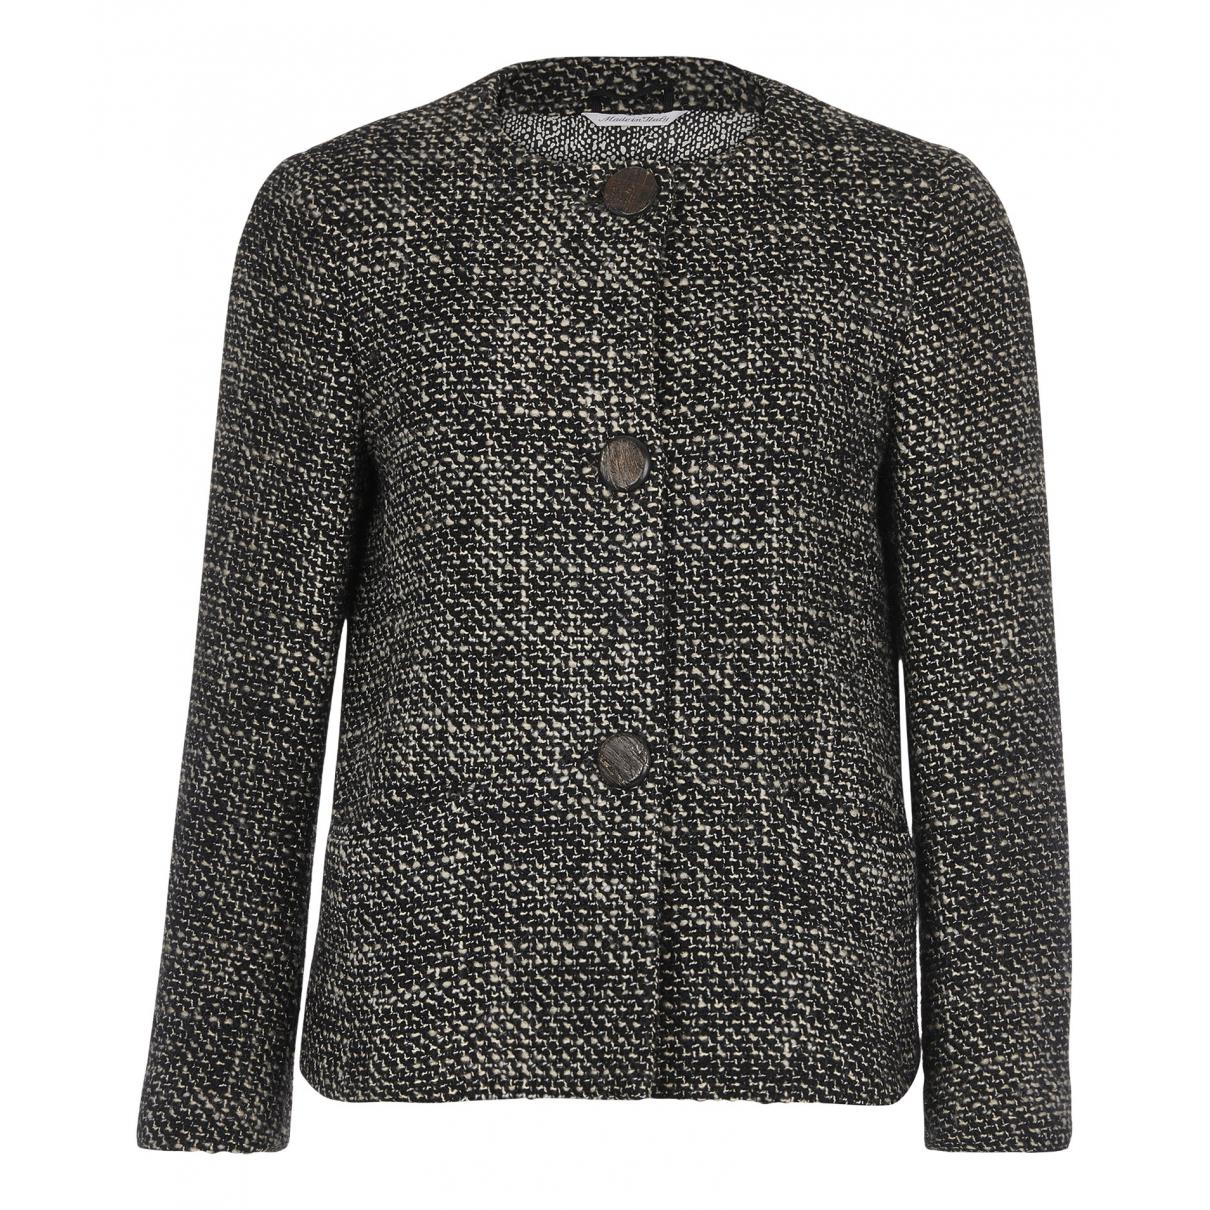 Max Mara N Multicolour Cotton jacket for Women 14 UK